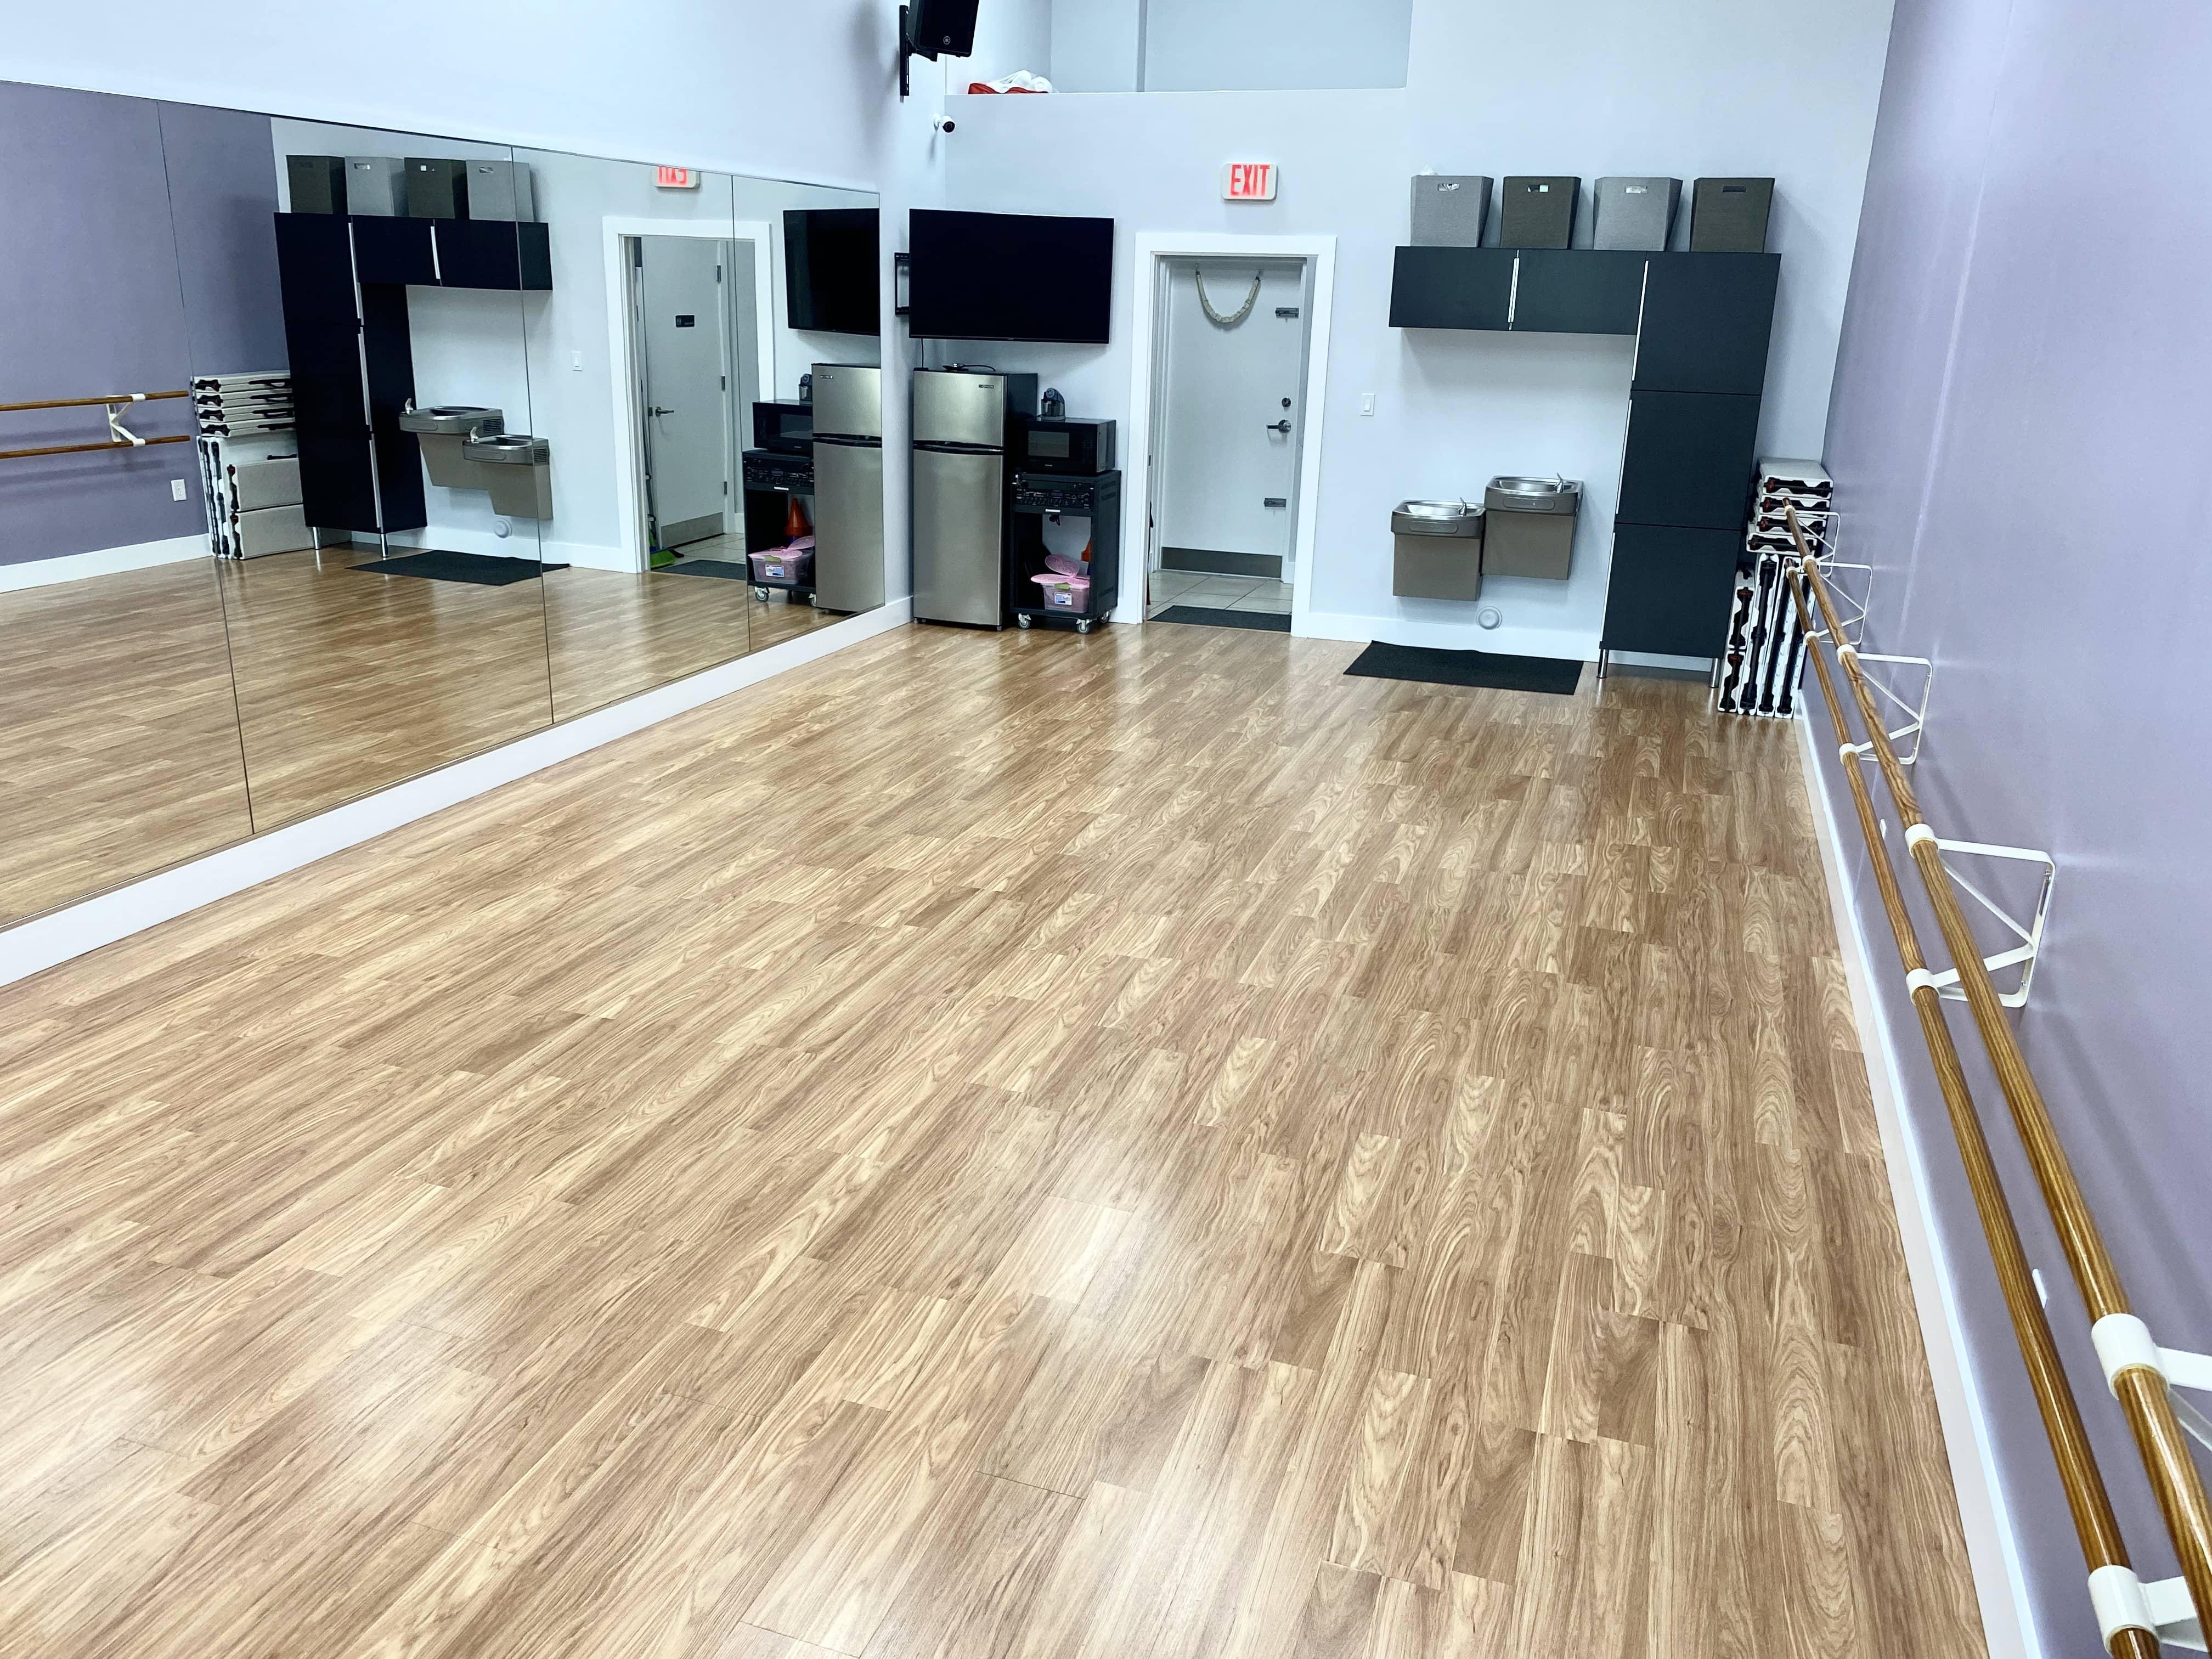 Dance floor of Creativo Dance Studio on 82nd Avenue in Miami, FL